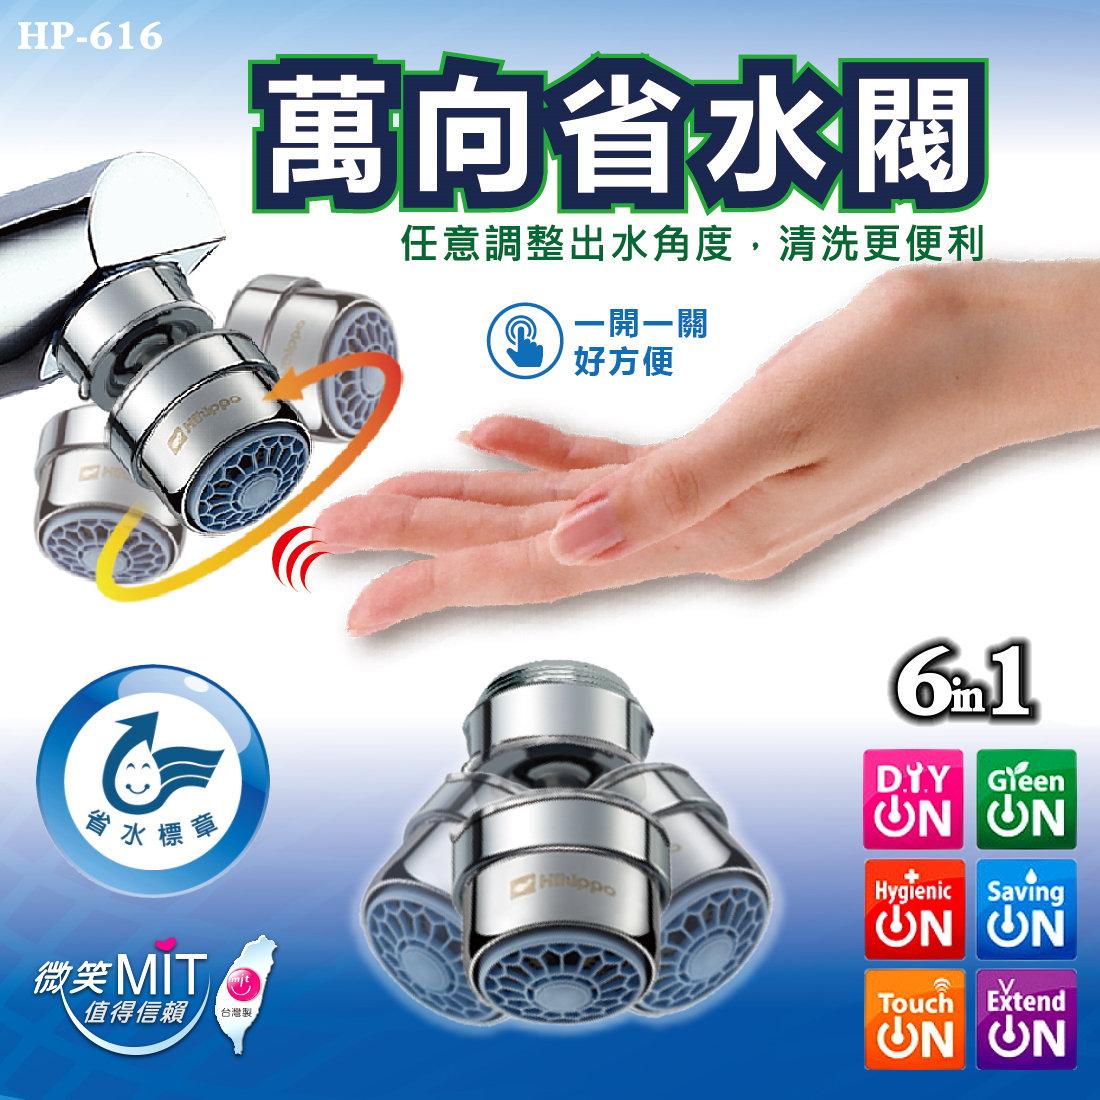 ♢Just-Play 捷仕特♢ HP-616 One Touch氣泡型萬向省水閥/萬向抗菌省水開關